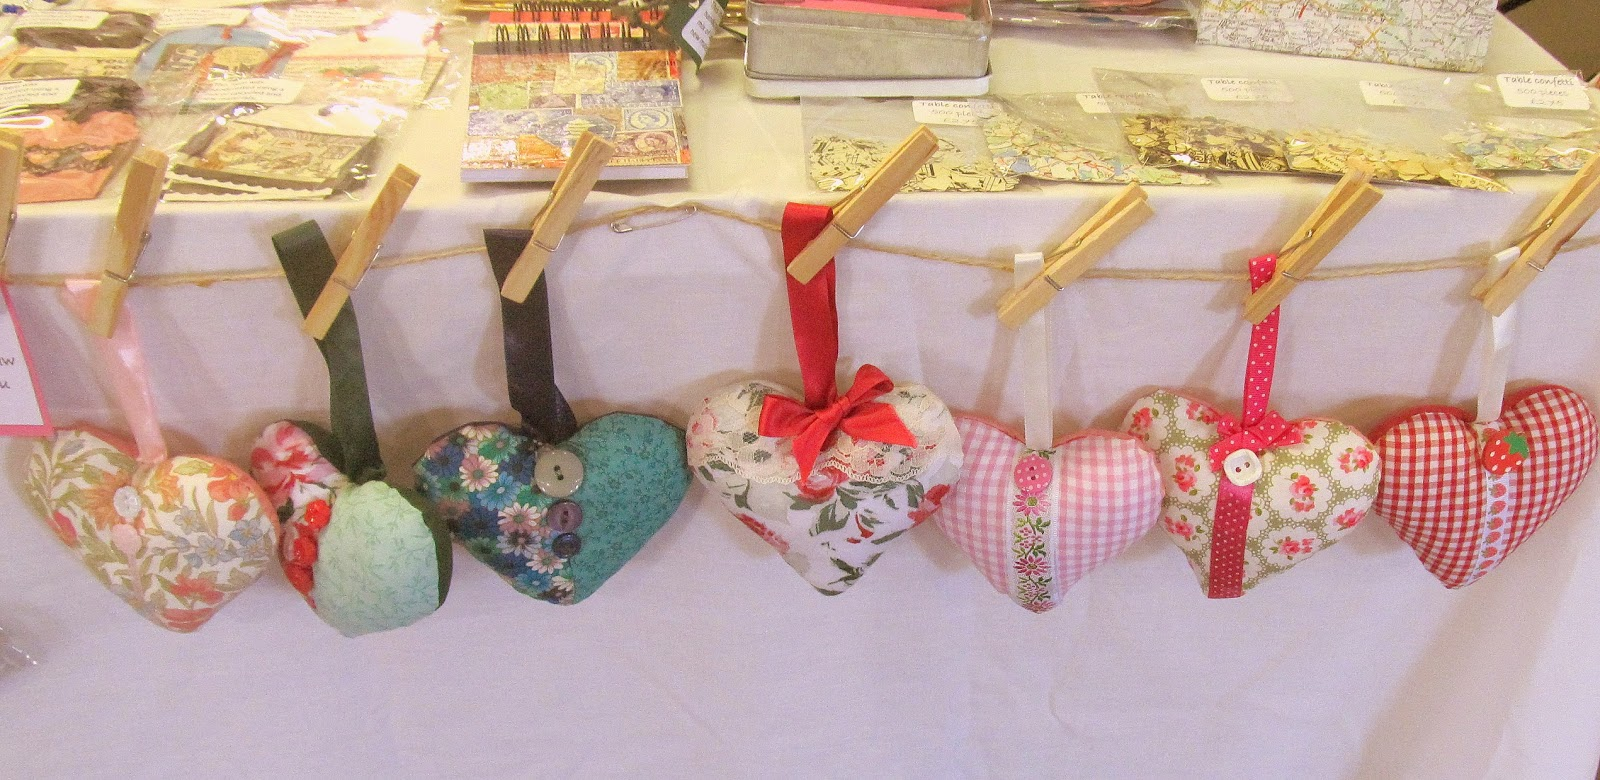 Pink Flamingo Handcrafting stall